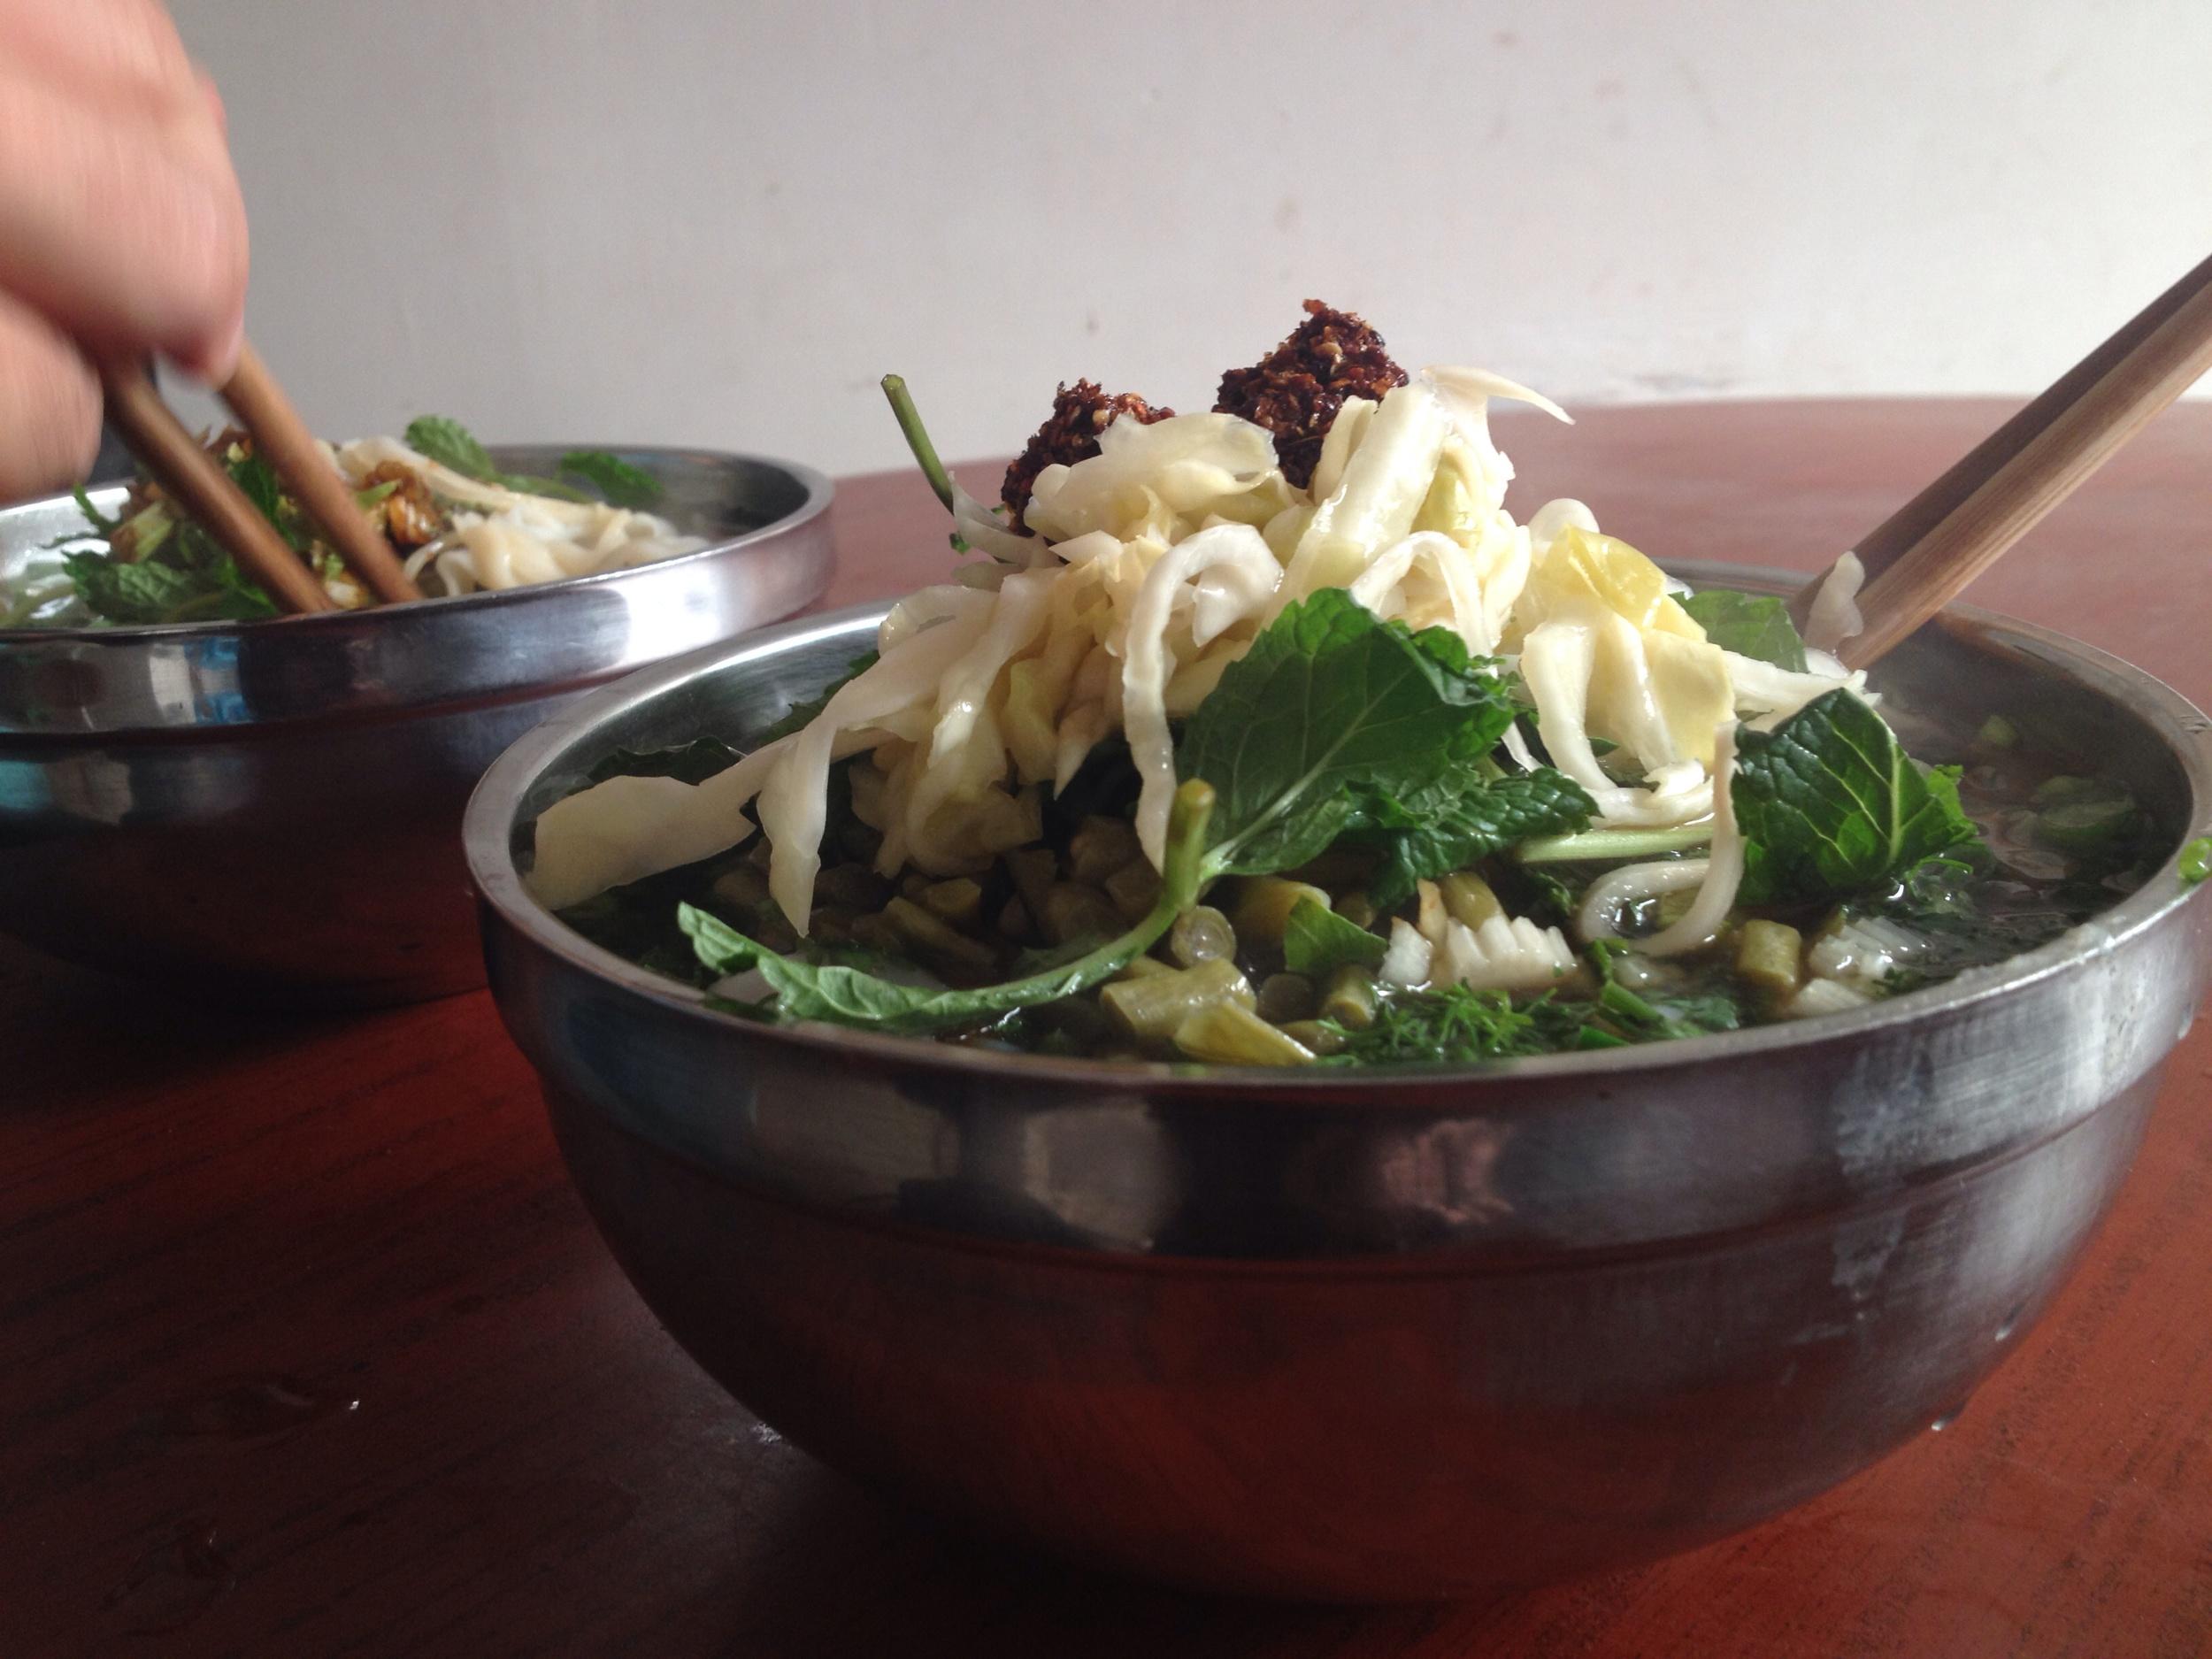 5 Kuai local noodles with fresh herbs, veggies and chili. Y-U-M